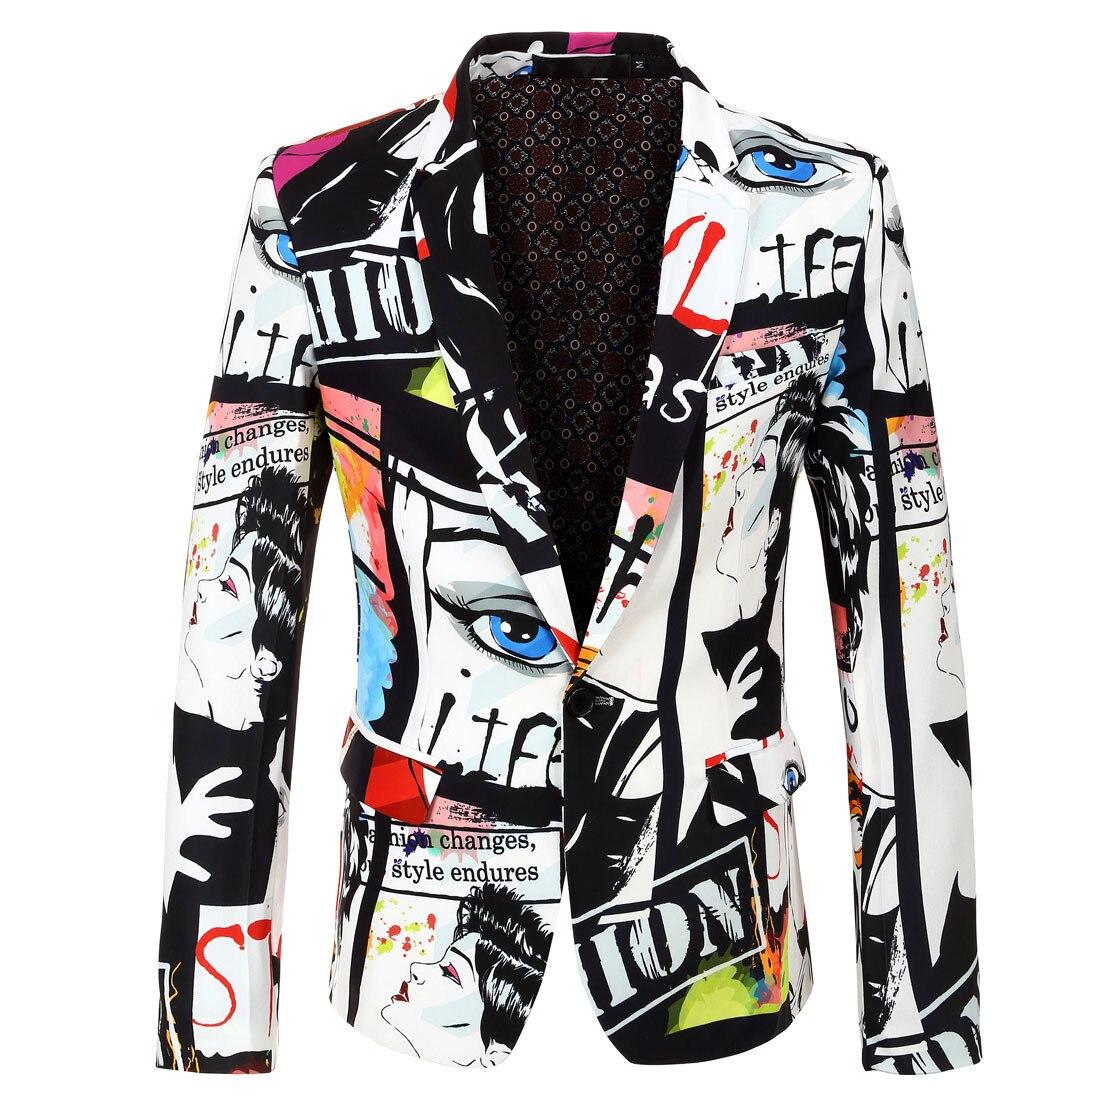 Blazer for Men 2019 Spring Harajuku Printing Casual Blazers Plus Size Graffiti Personality Men's Jacket Fashion Suit Jackets